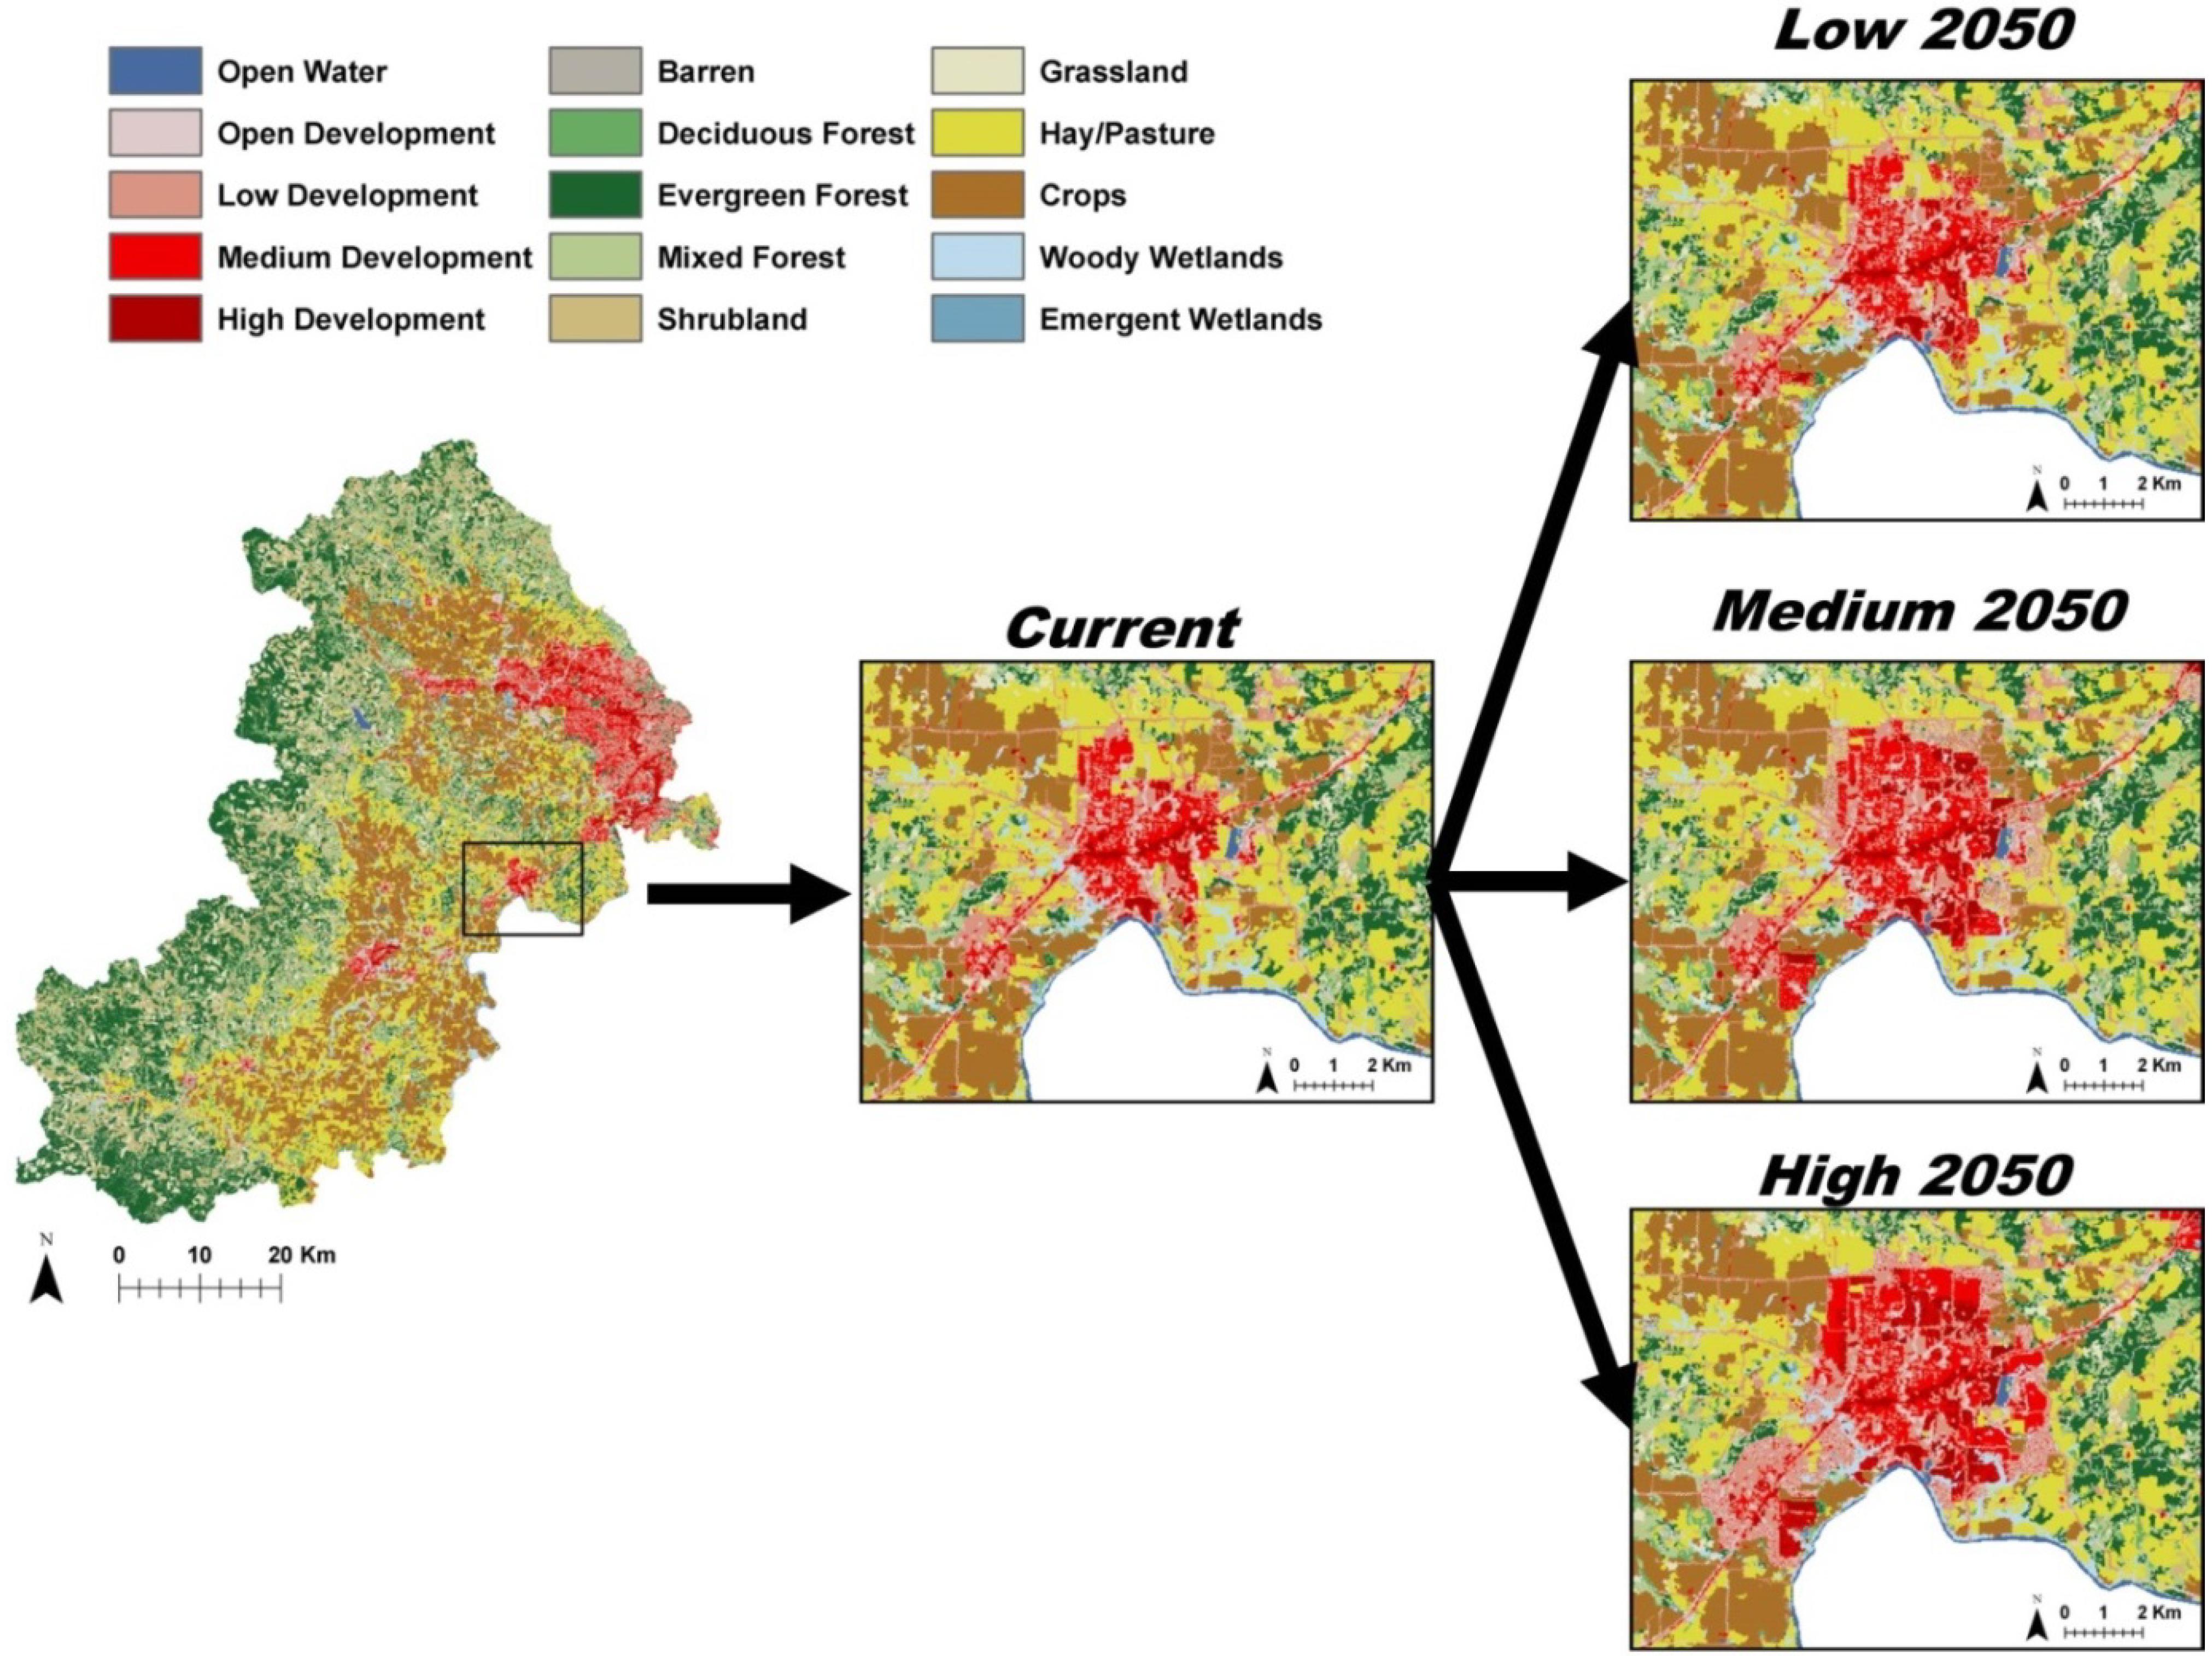 Land Free FullText Development of Future Land Cover Change